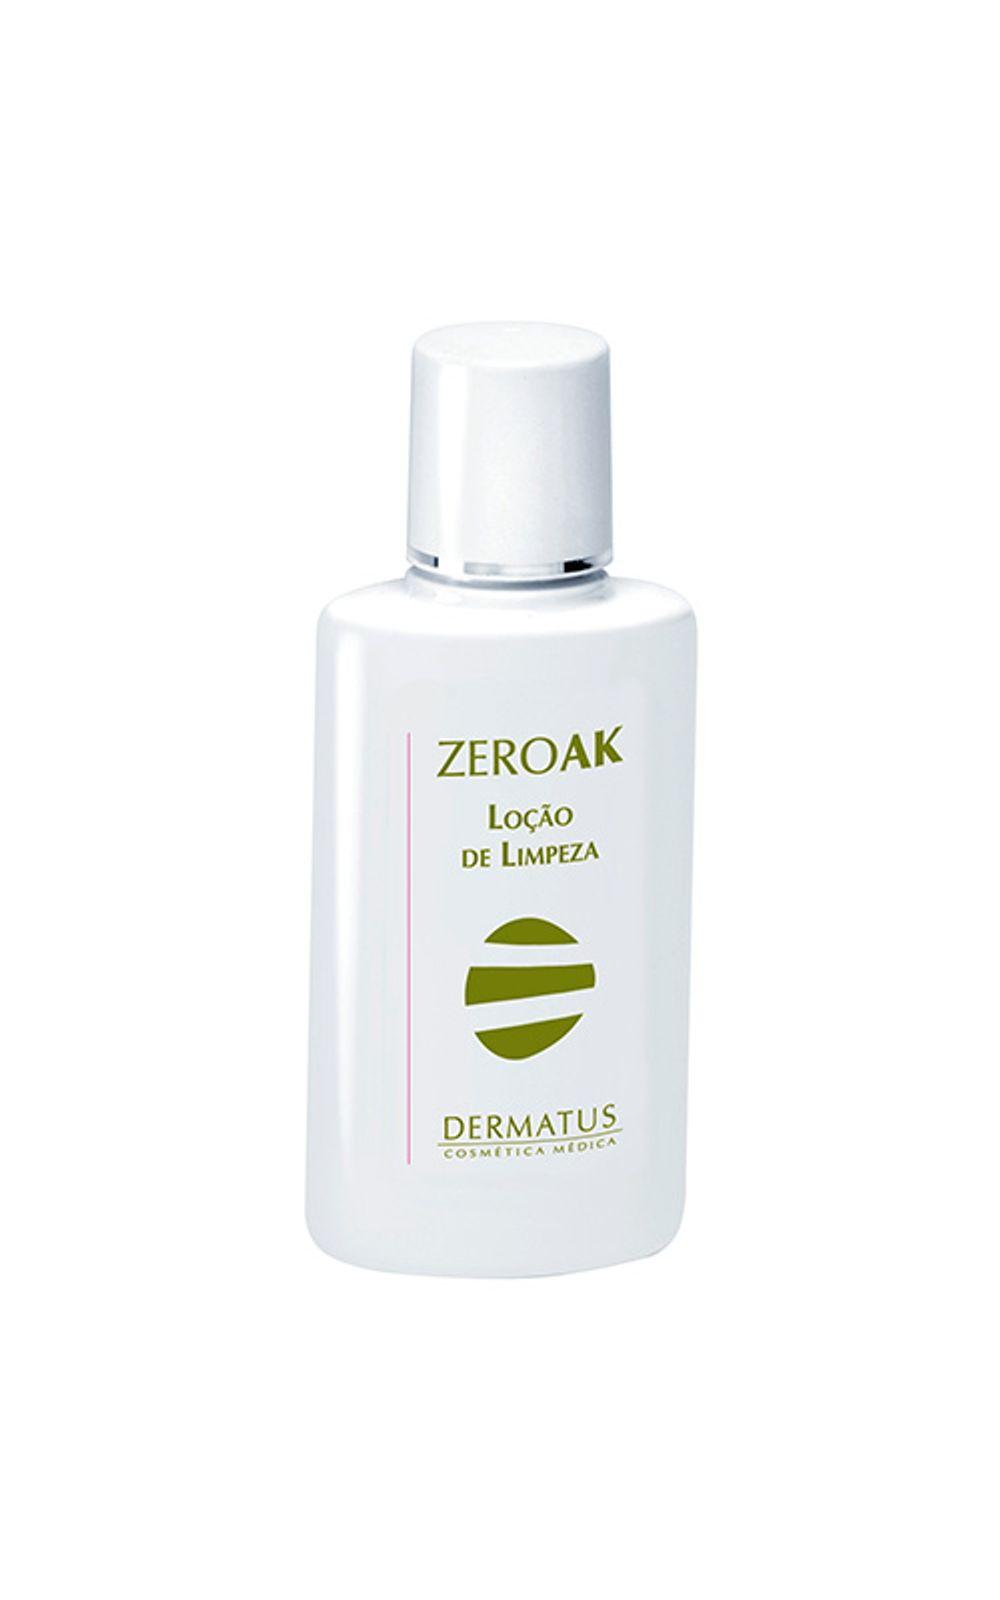 Foto 1 - ZeroAK Loção de Limpeza Dermatus - Tratamento Desobstrutor de Poros - 120ml